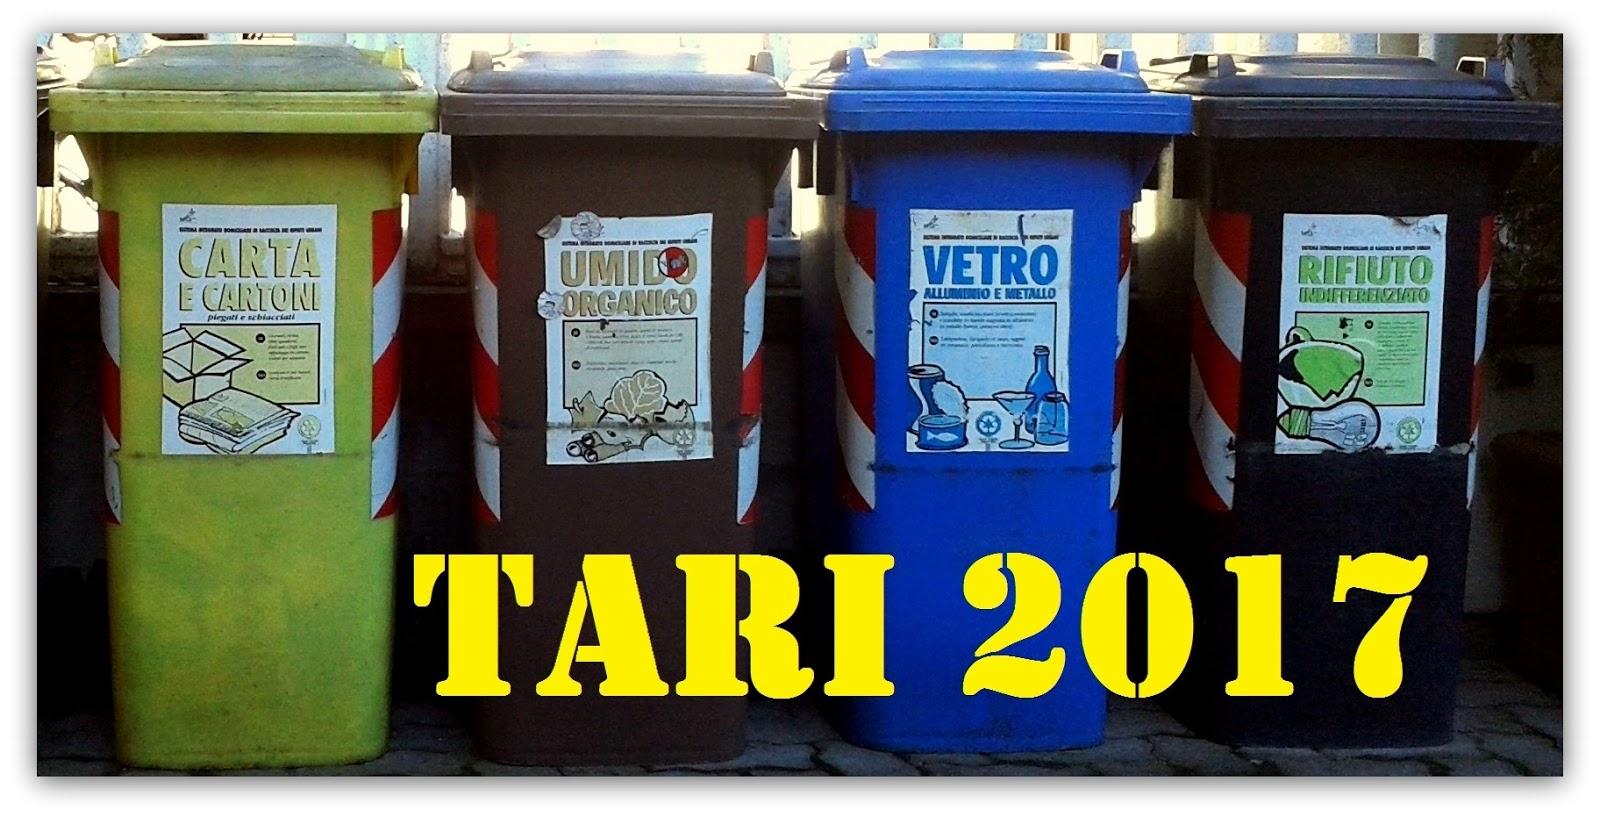 Alternativa civica brandizzo tassa rifiuti 2017 for Scadenza irpef 2017